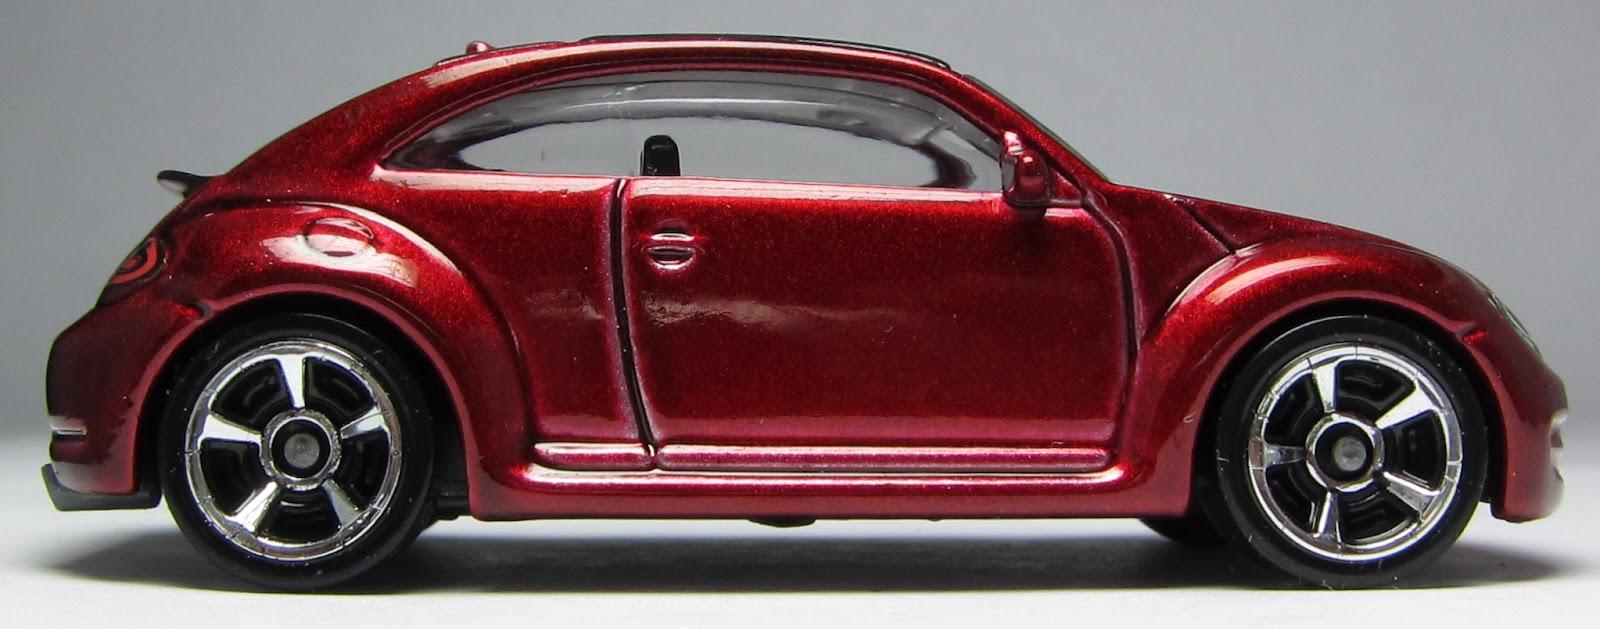 first look hot wheels 2012 volkswagen beetle - Rare Hot Wheels Cars 2012